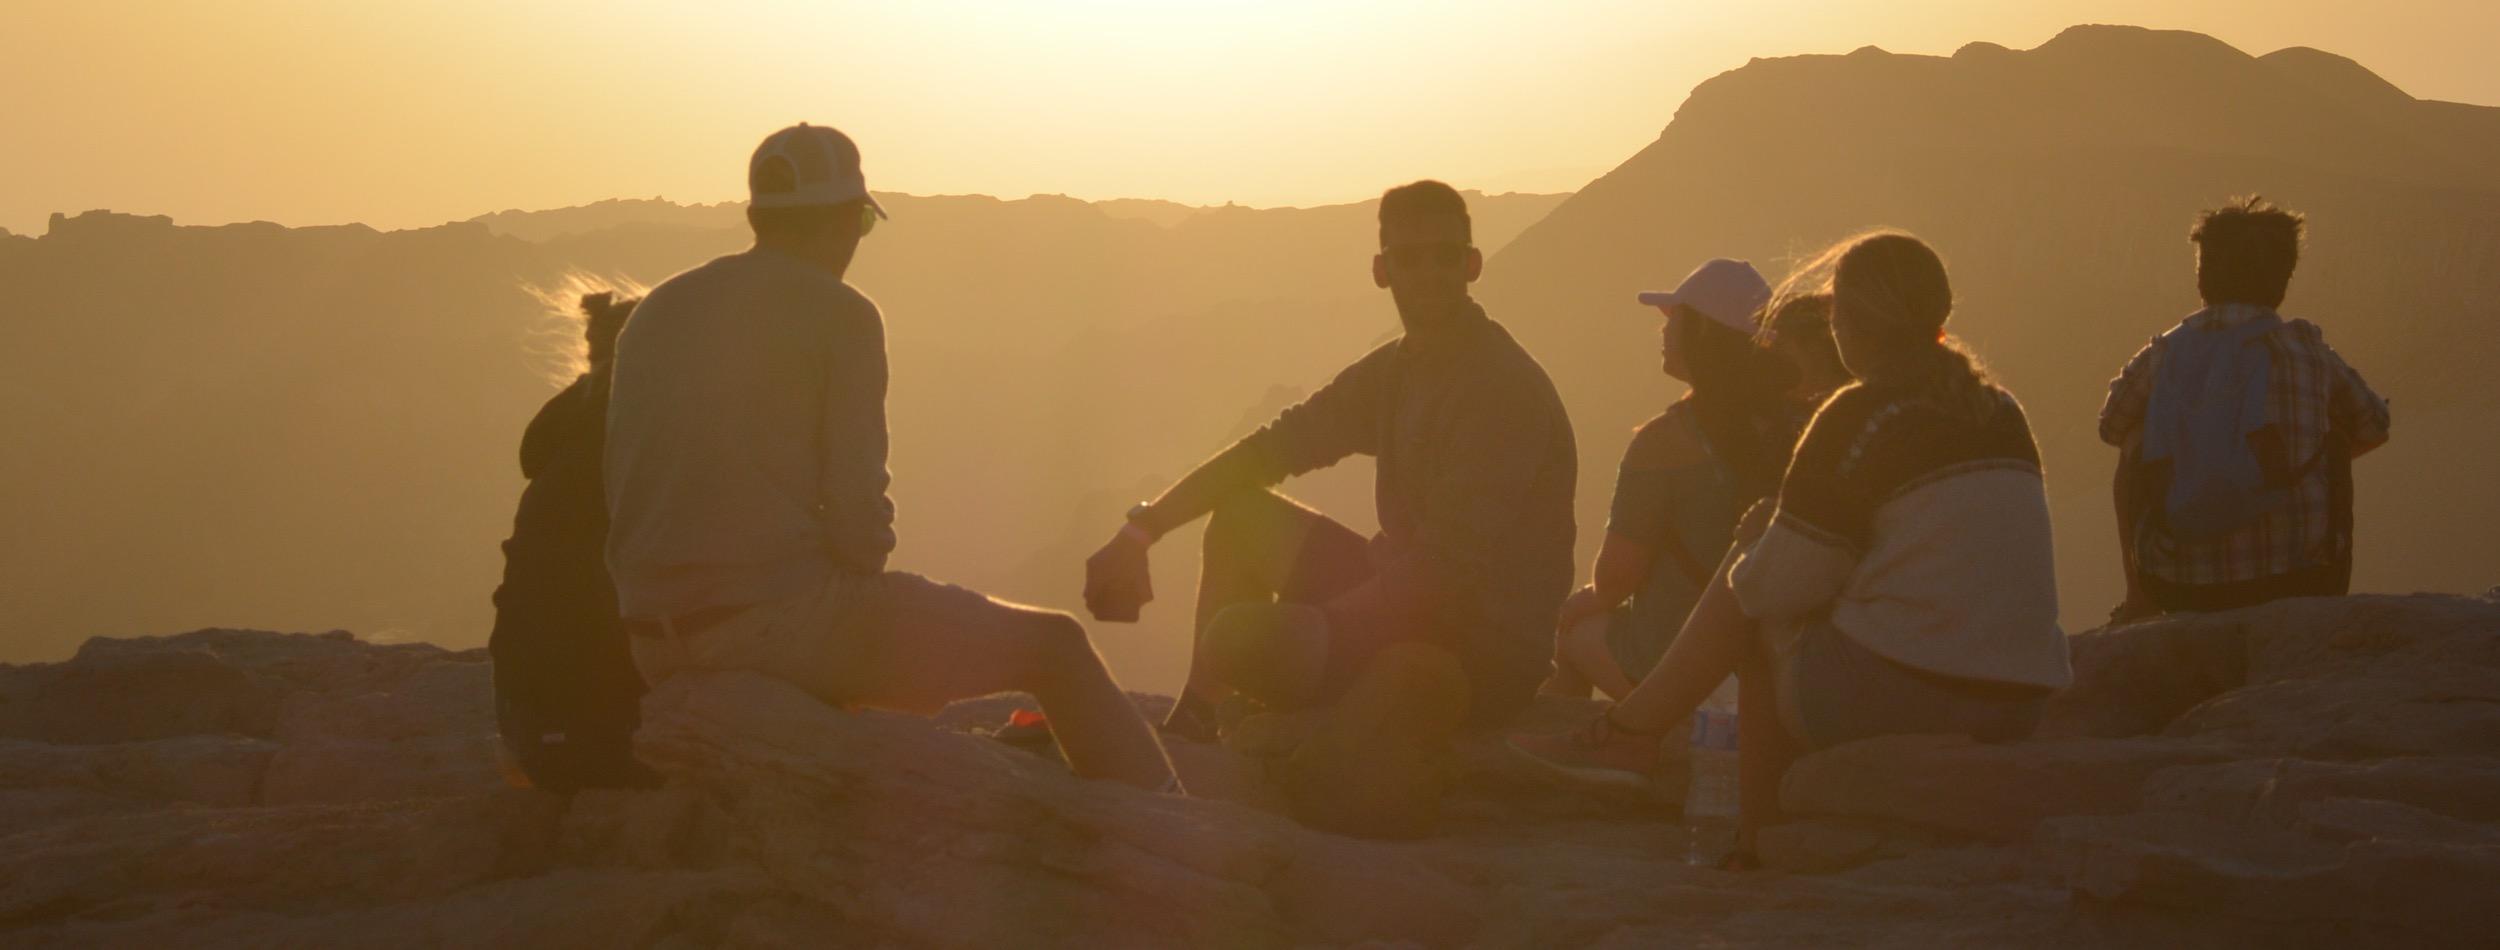 Группа людей на закате солнца